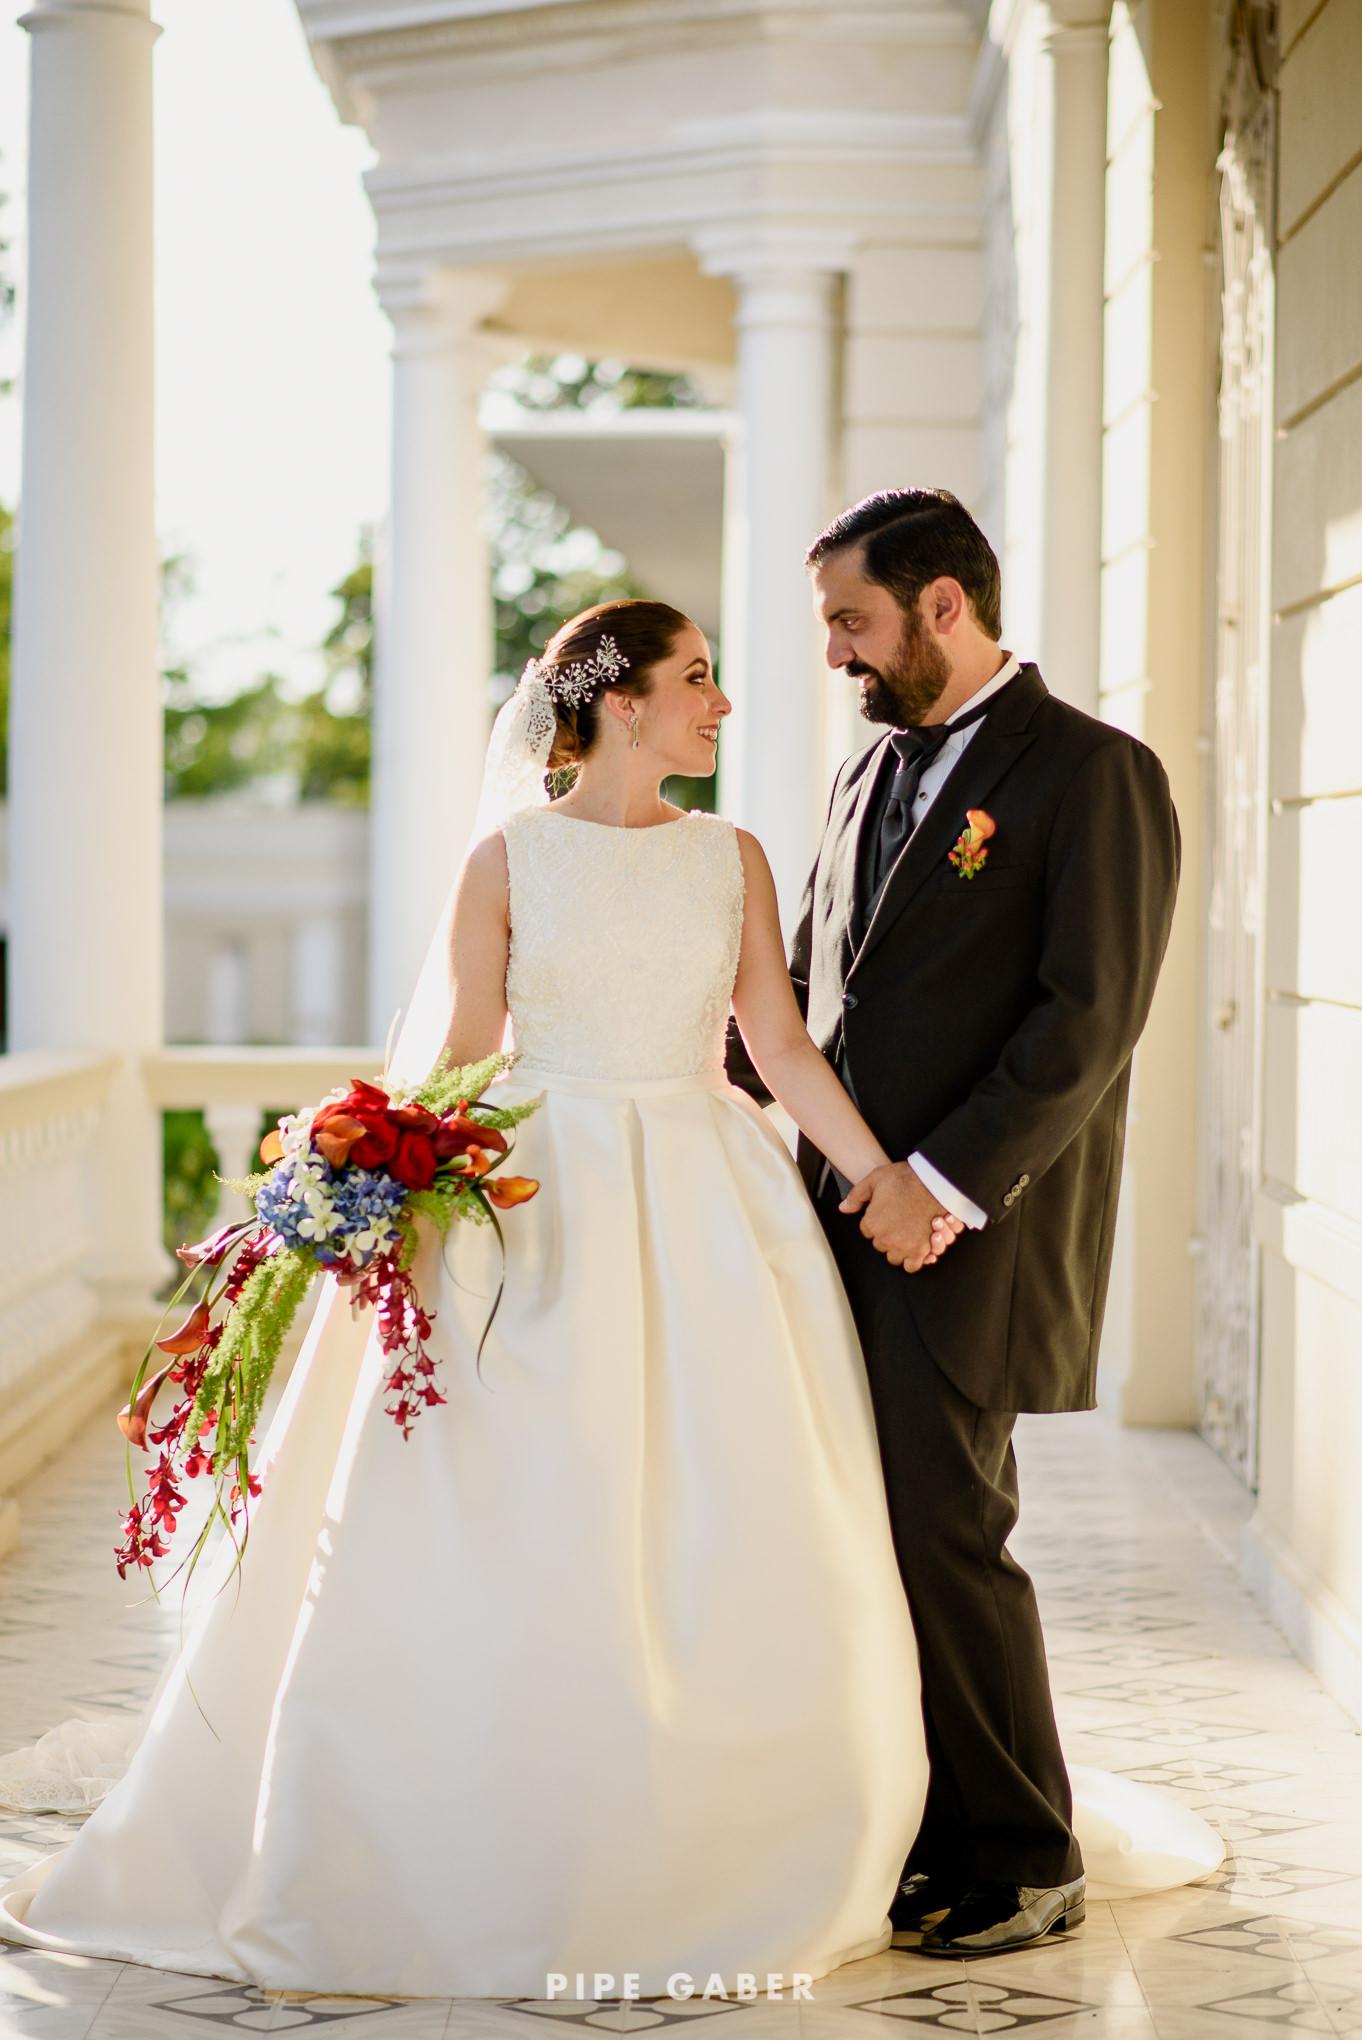 17_02_18_WEDDING_AIDITA_NEZBIT_MIGUEL_DOGRE_91_web.jpg